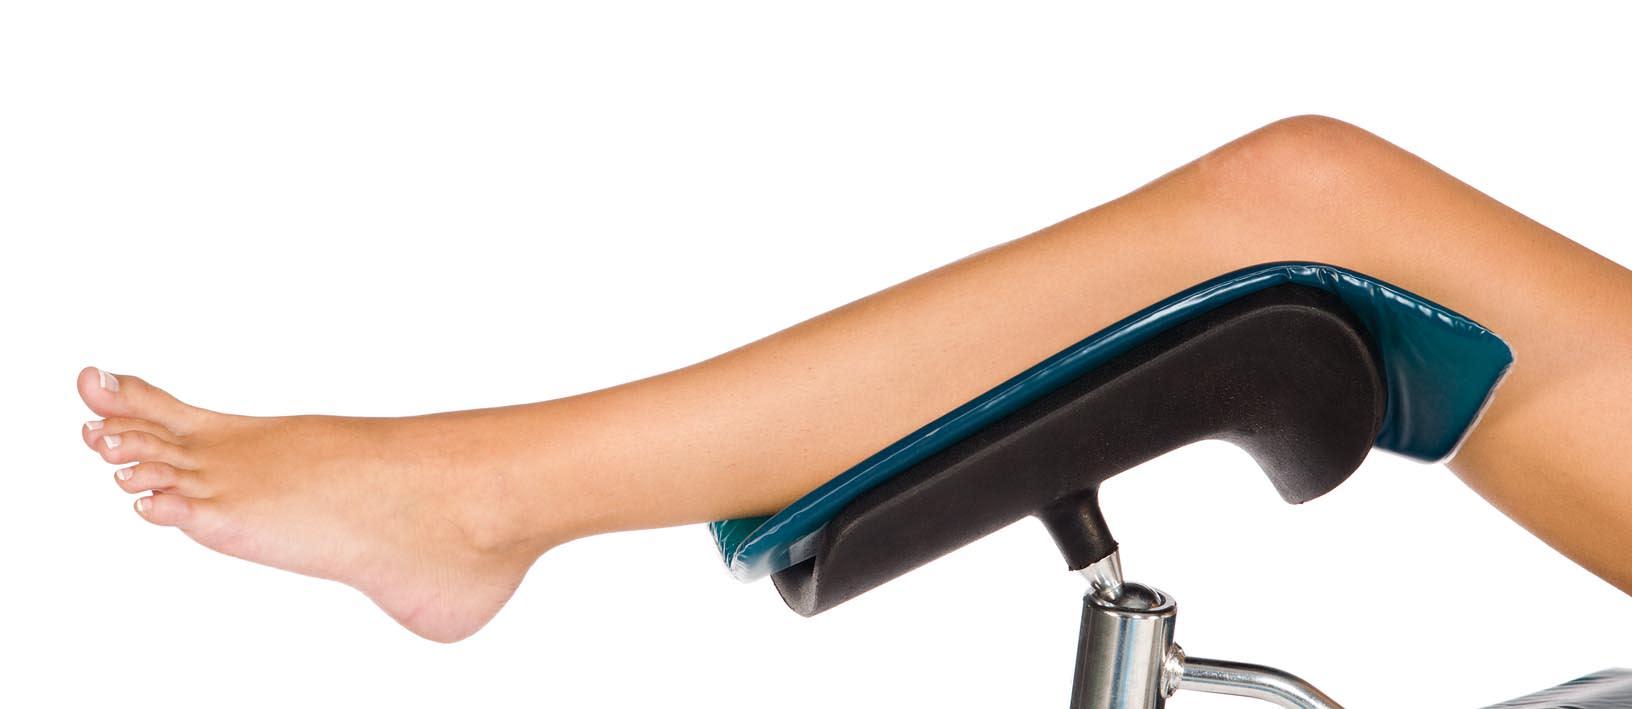 Oasis Crutch Stirrup Pad (OA090) - Adolescent / Adult - 320 x 220 x 10mm